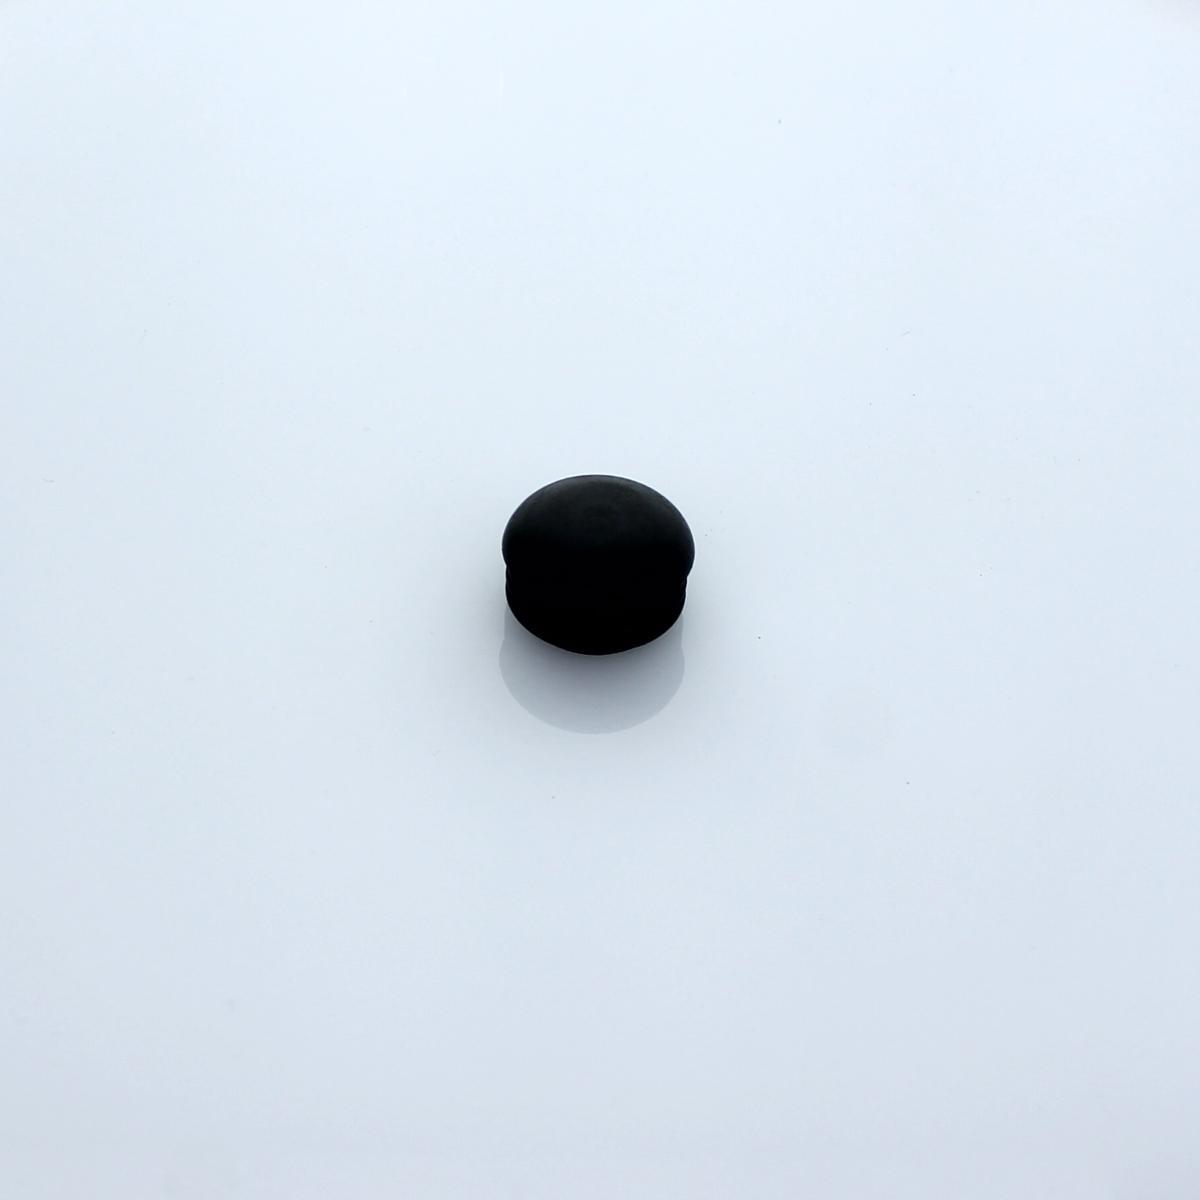 abdeckkappe als stopfen 28 mm kunststoff schwarz abdeckkappe als stopfen 28 mm kunststoff. Black Bedroom Furniture Sets. Home Design Ideas